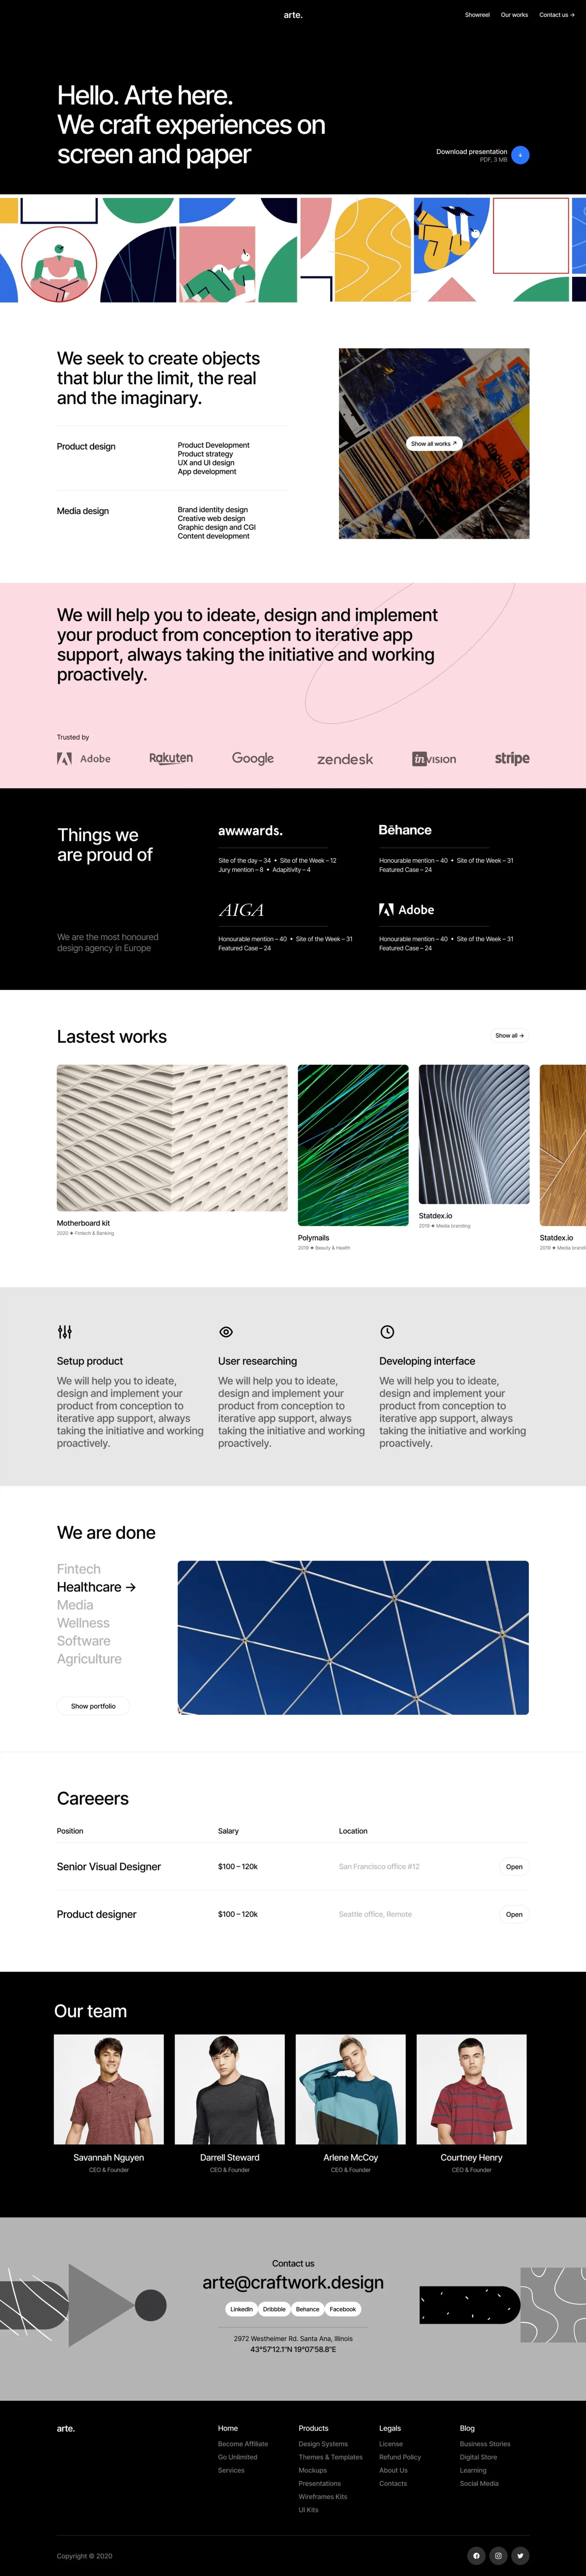 Arte Website Screenshot